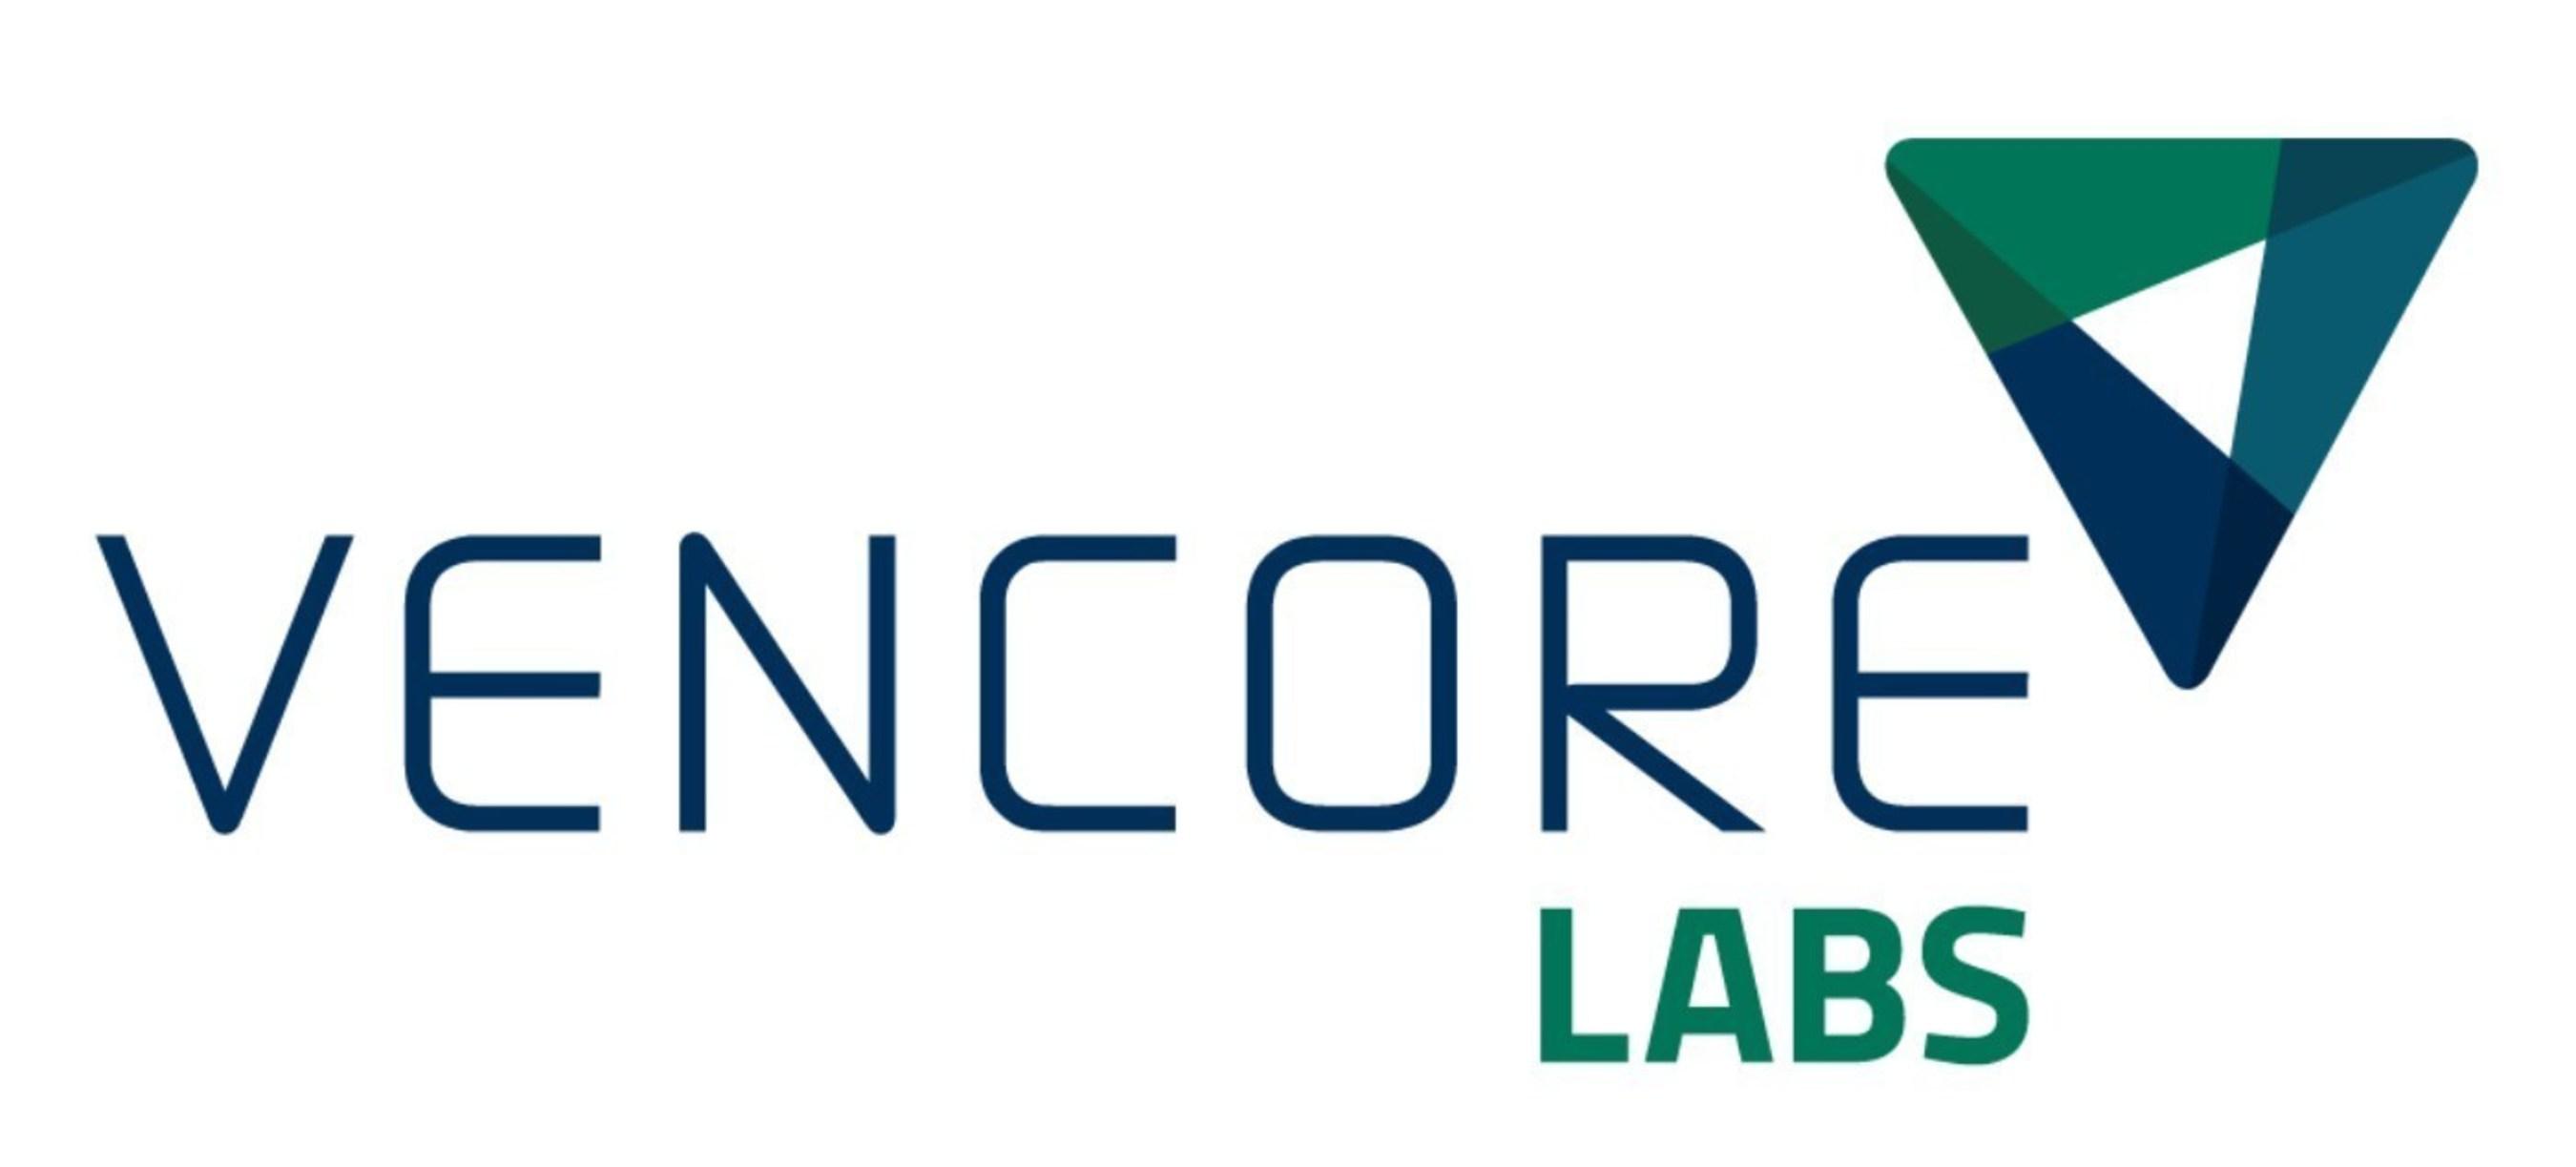 Vencore to Develop Advanced Cryptographic Obfuscation Techniques for DARPA